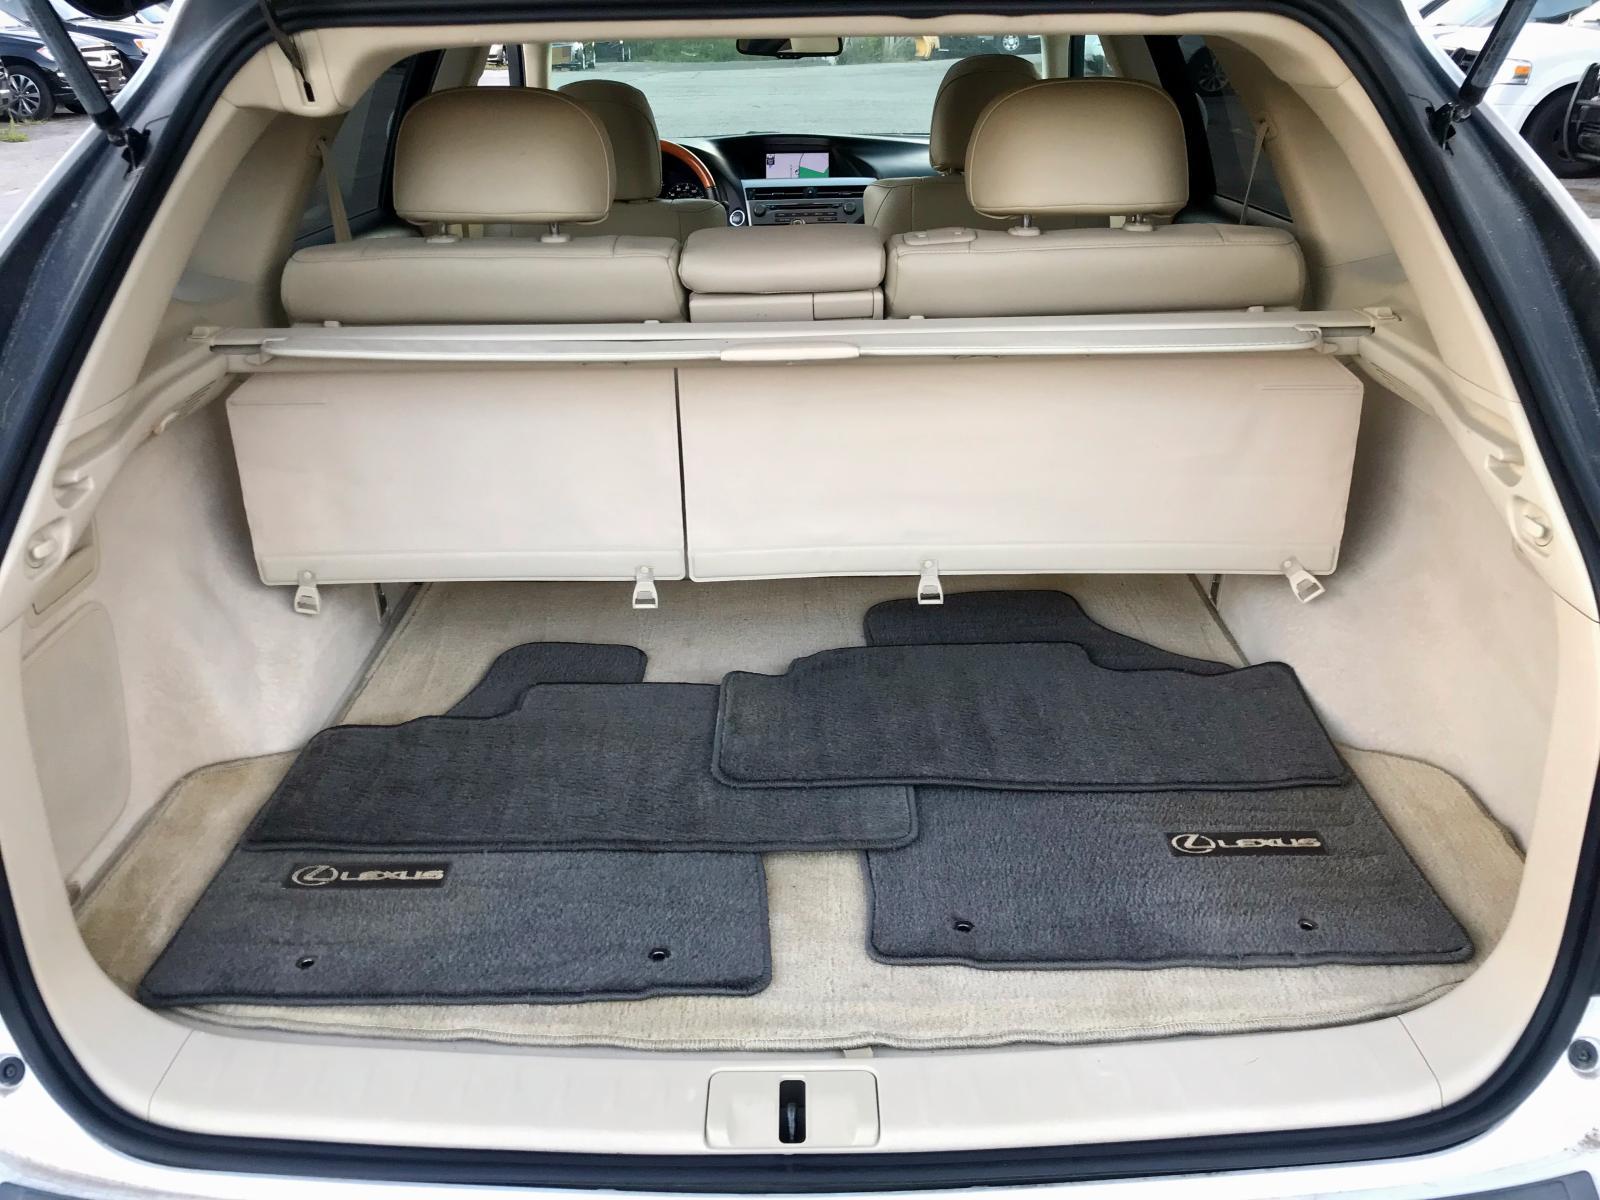 2T2BK1BA3BC118286 - 2011 Lexus Rx 350 3.5L